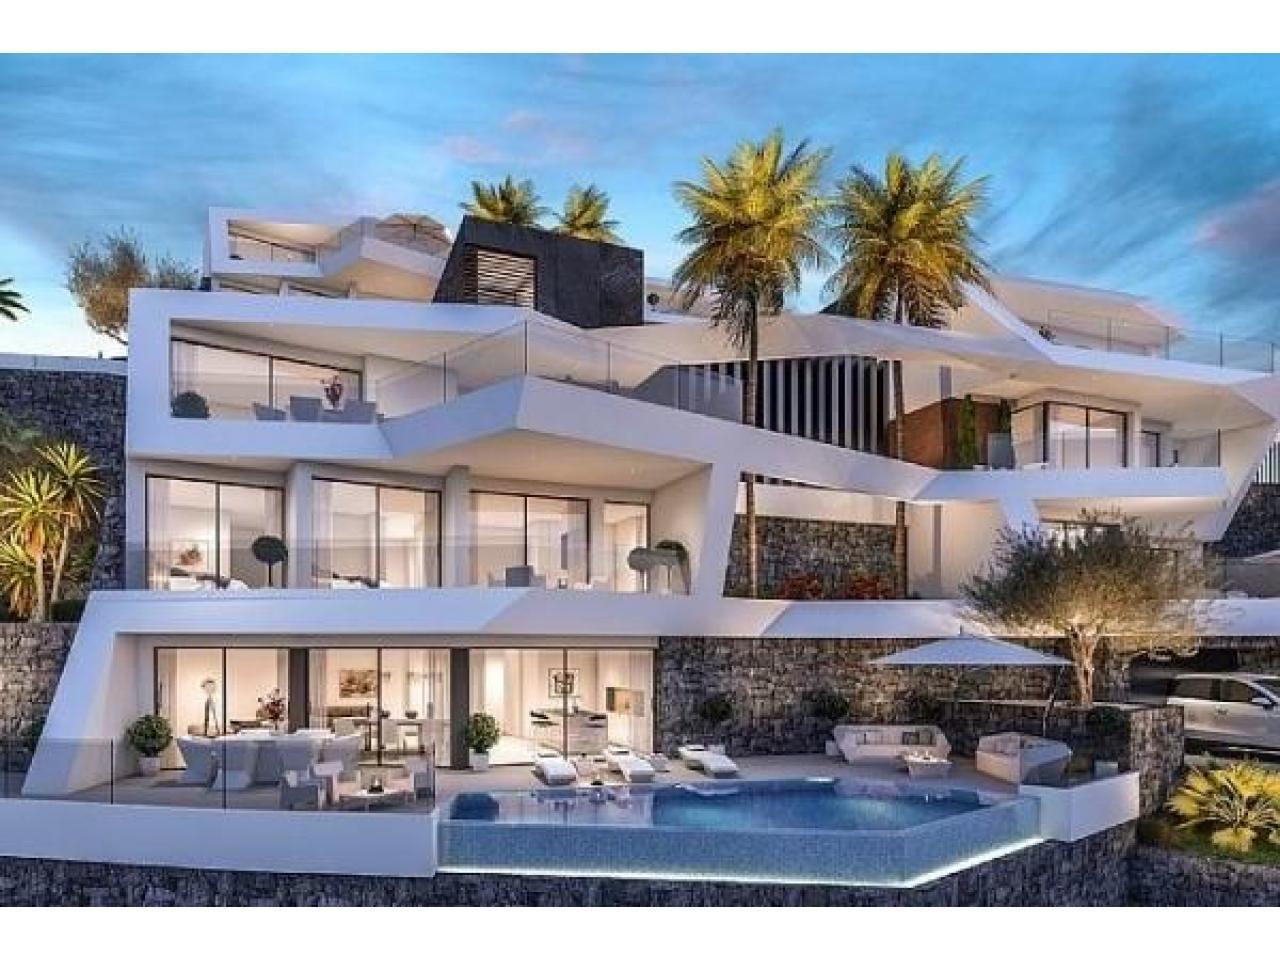 Недвижимость в Испании, Новая вилла с видами на море от застройщика в Альтеа,Коста Бланка,Испания - 9